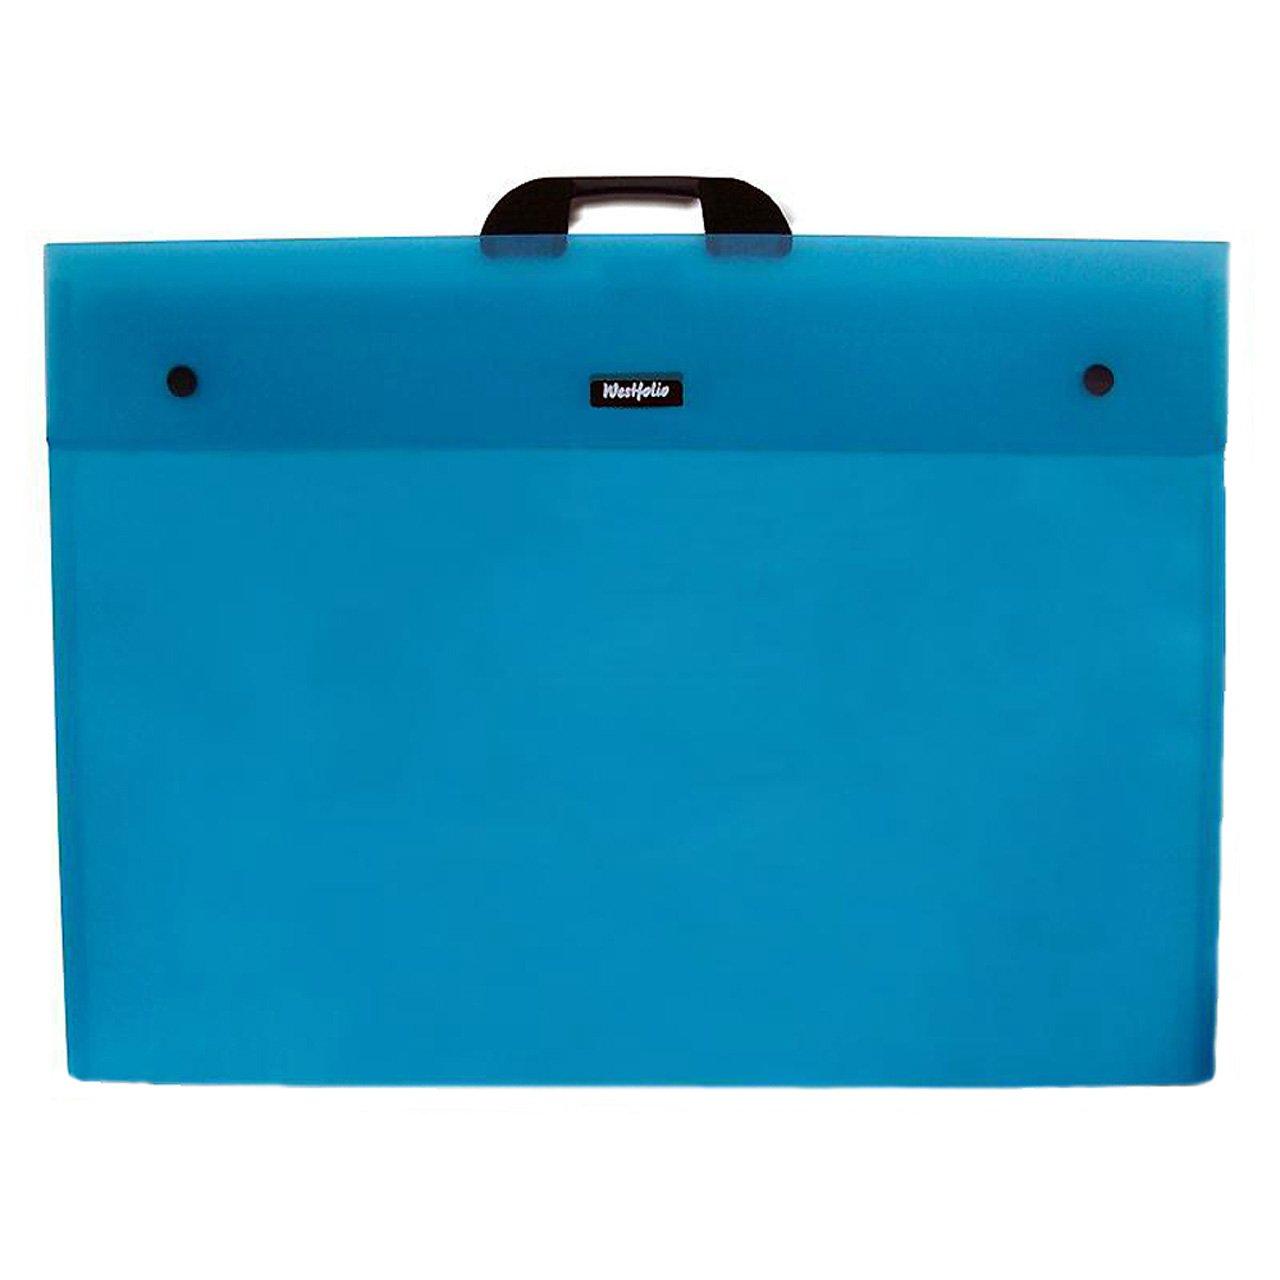 West A1, Design DKFAA1TU Westfolio - Carpeta plástica, DIN A1, West color azul da91b2